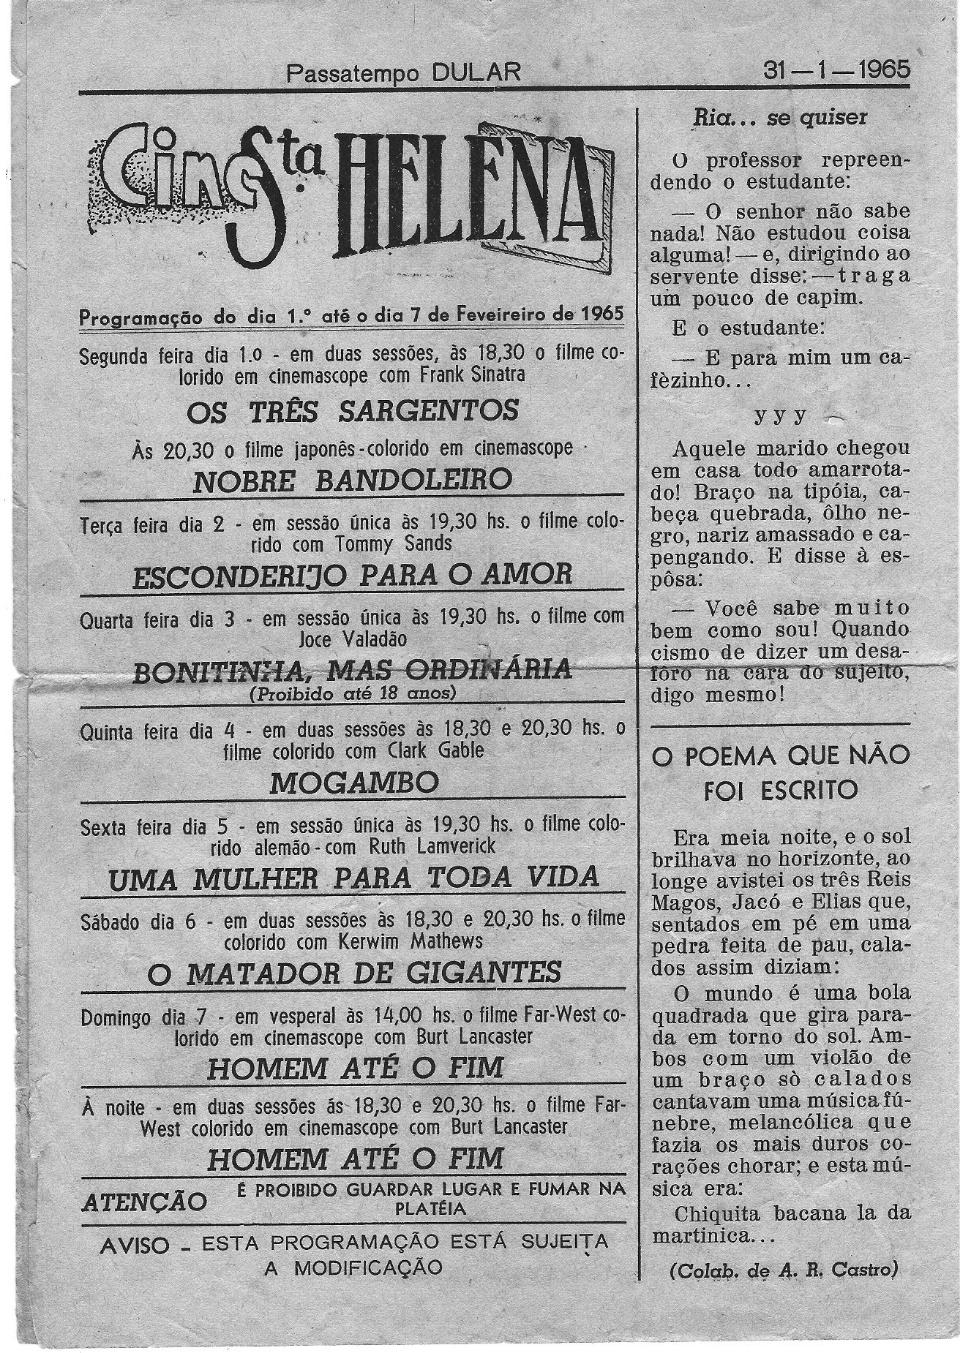 02. PASSATEMPO DULAR - 10 a 31.01.1965